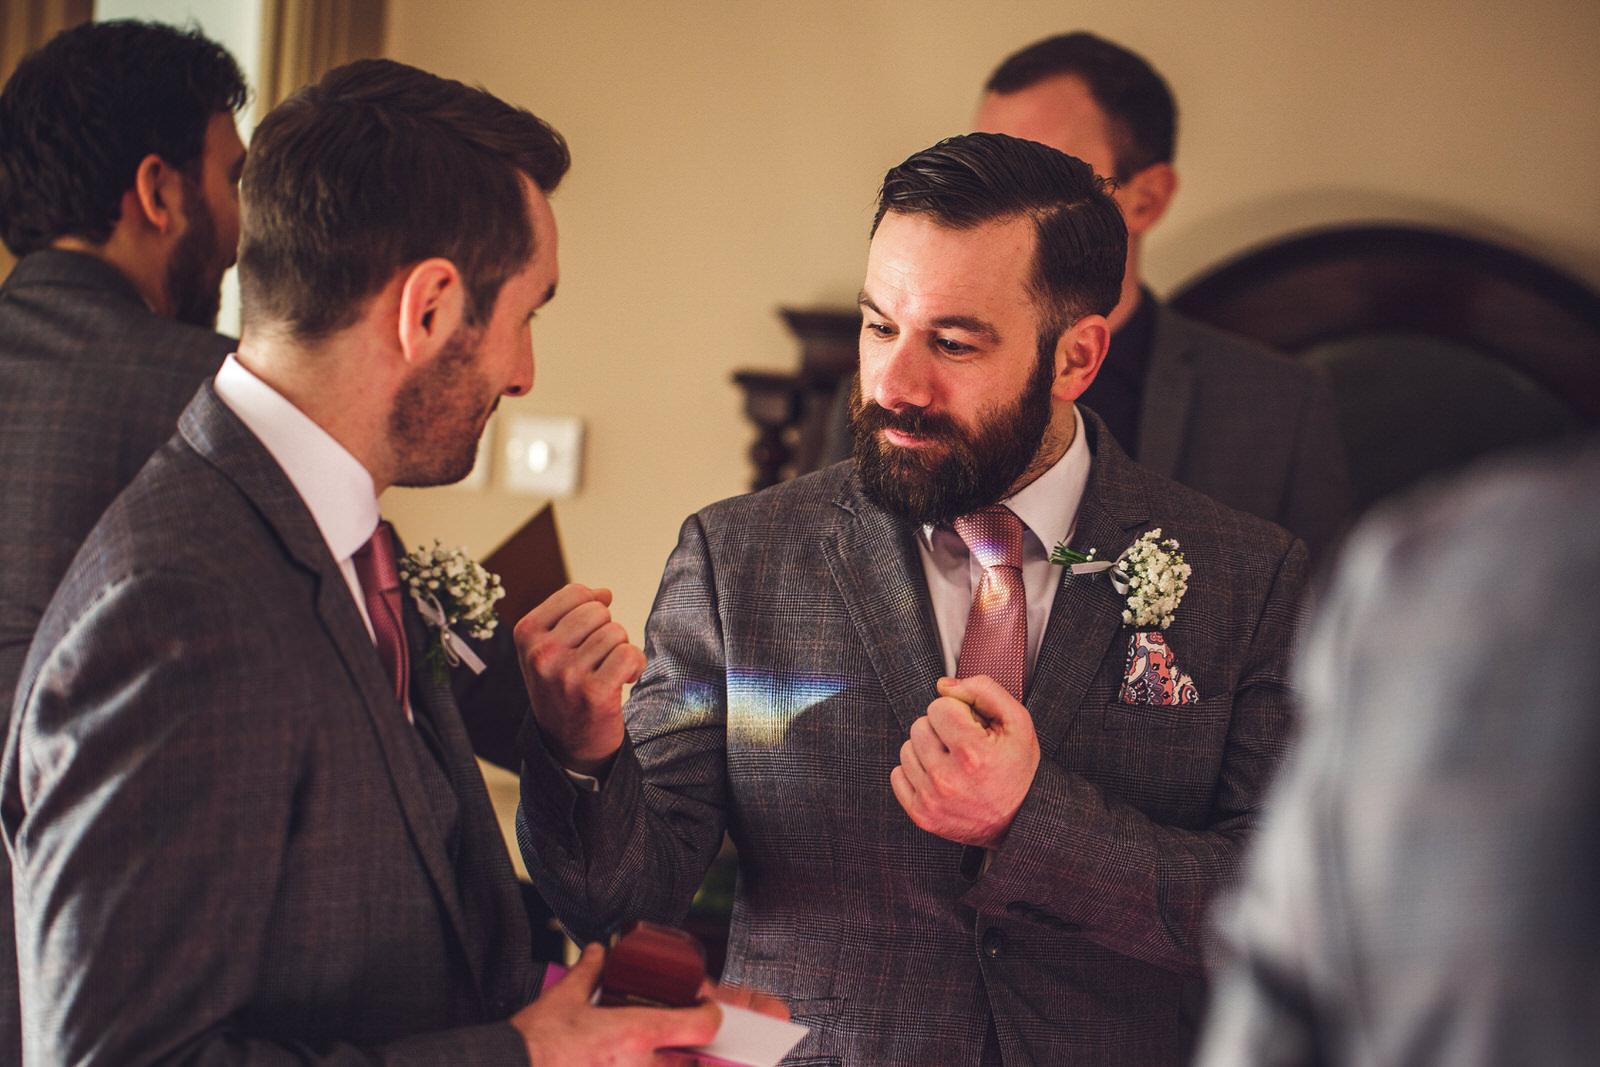 Roger-kenny-wedding-photographer-greystones-wicklow-dublin_015.jpg